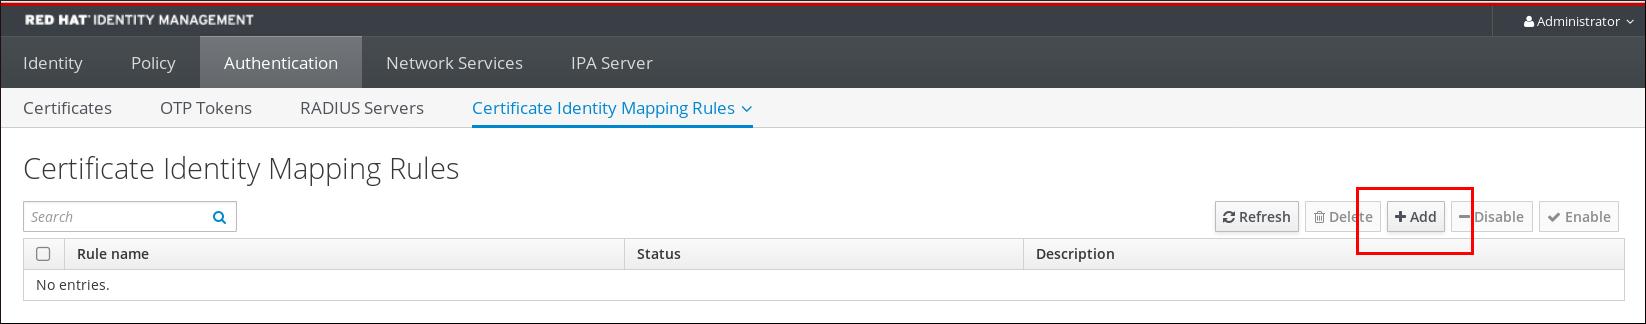 IdM Web UI での新規証明書マッピングルールの追加